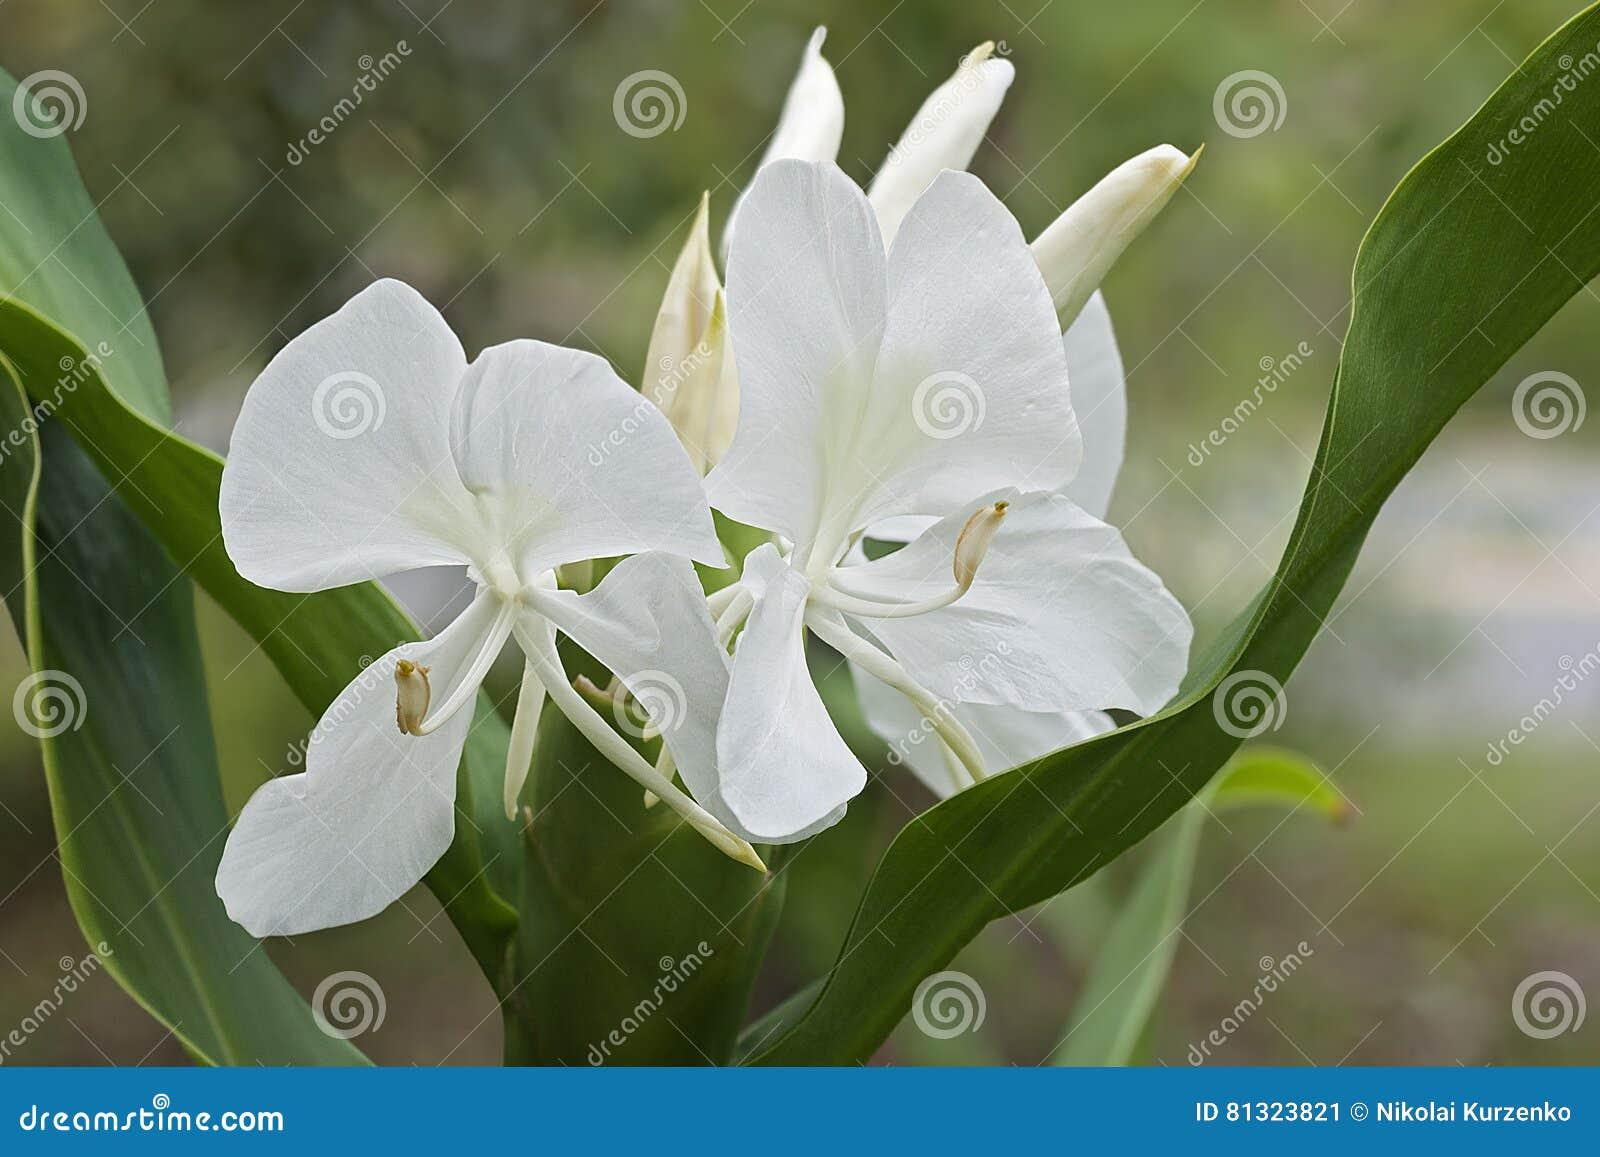 White Ginger Lily Flowers Stock Image Image Of Horizontal 81323821